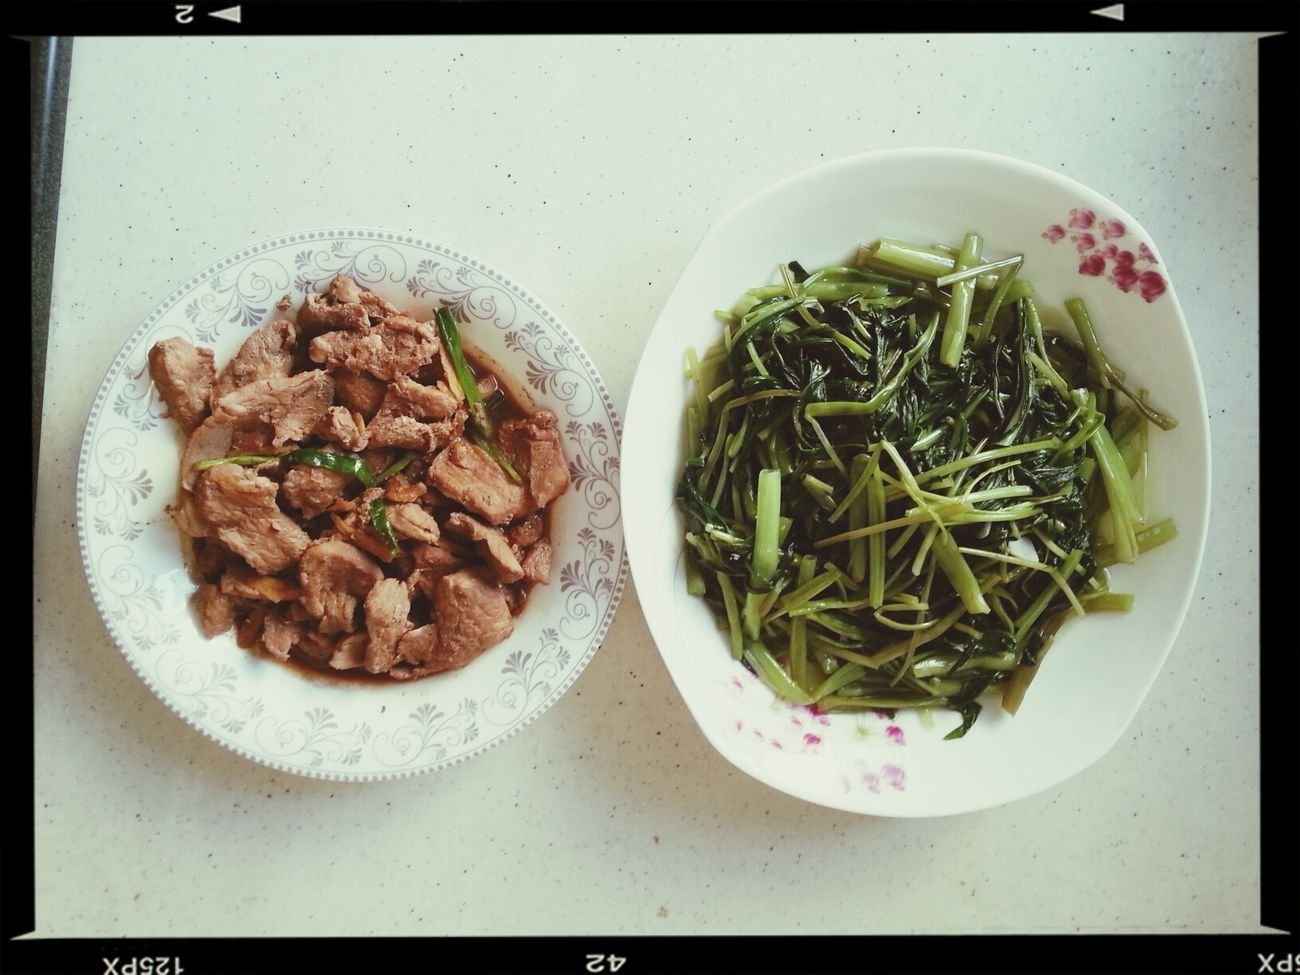 Dinner Lunch Box Taiwanese Food 今天的晚餐明日的中餐